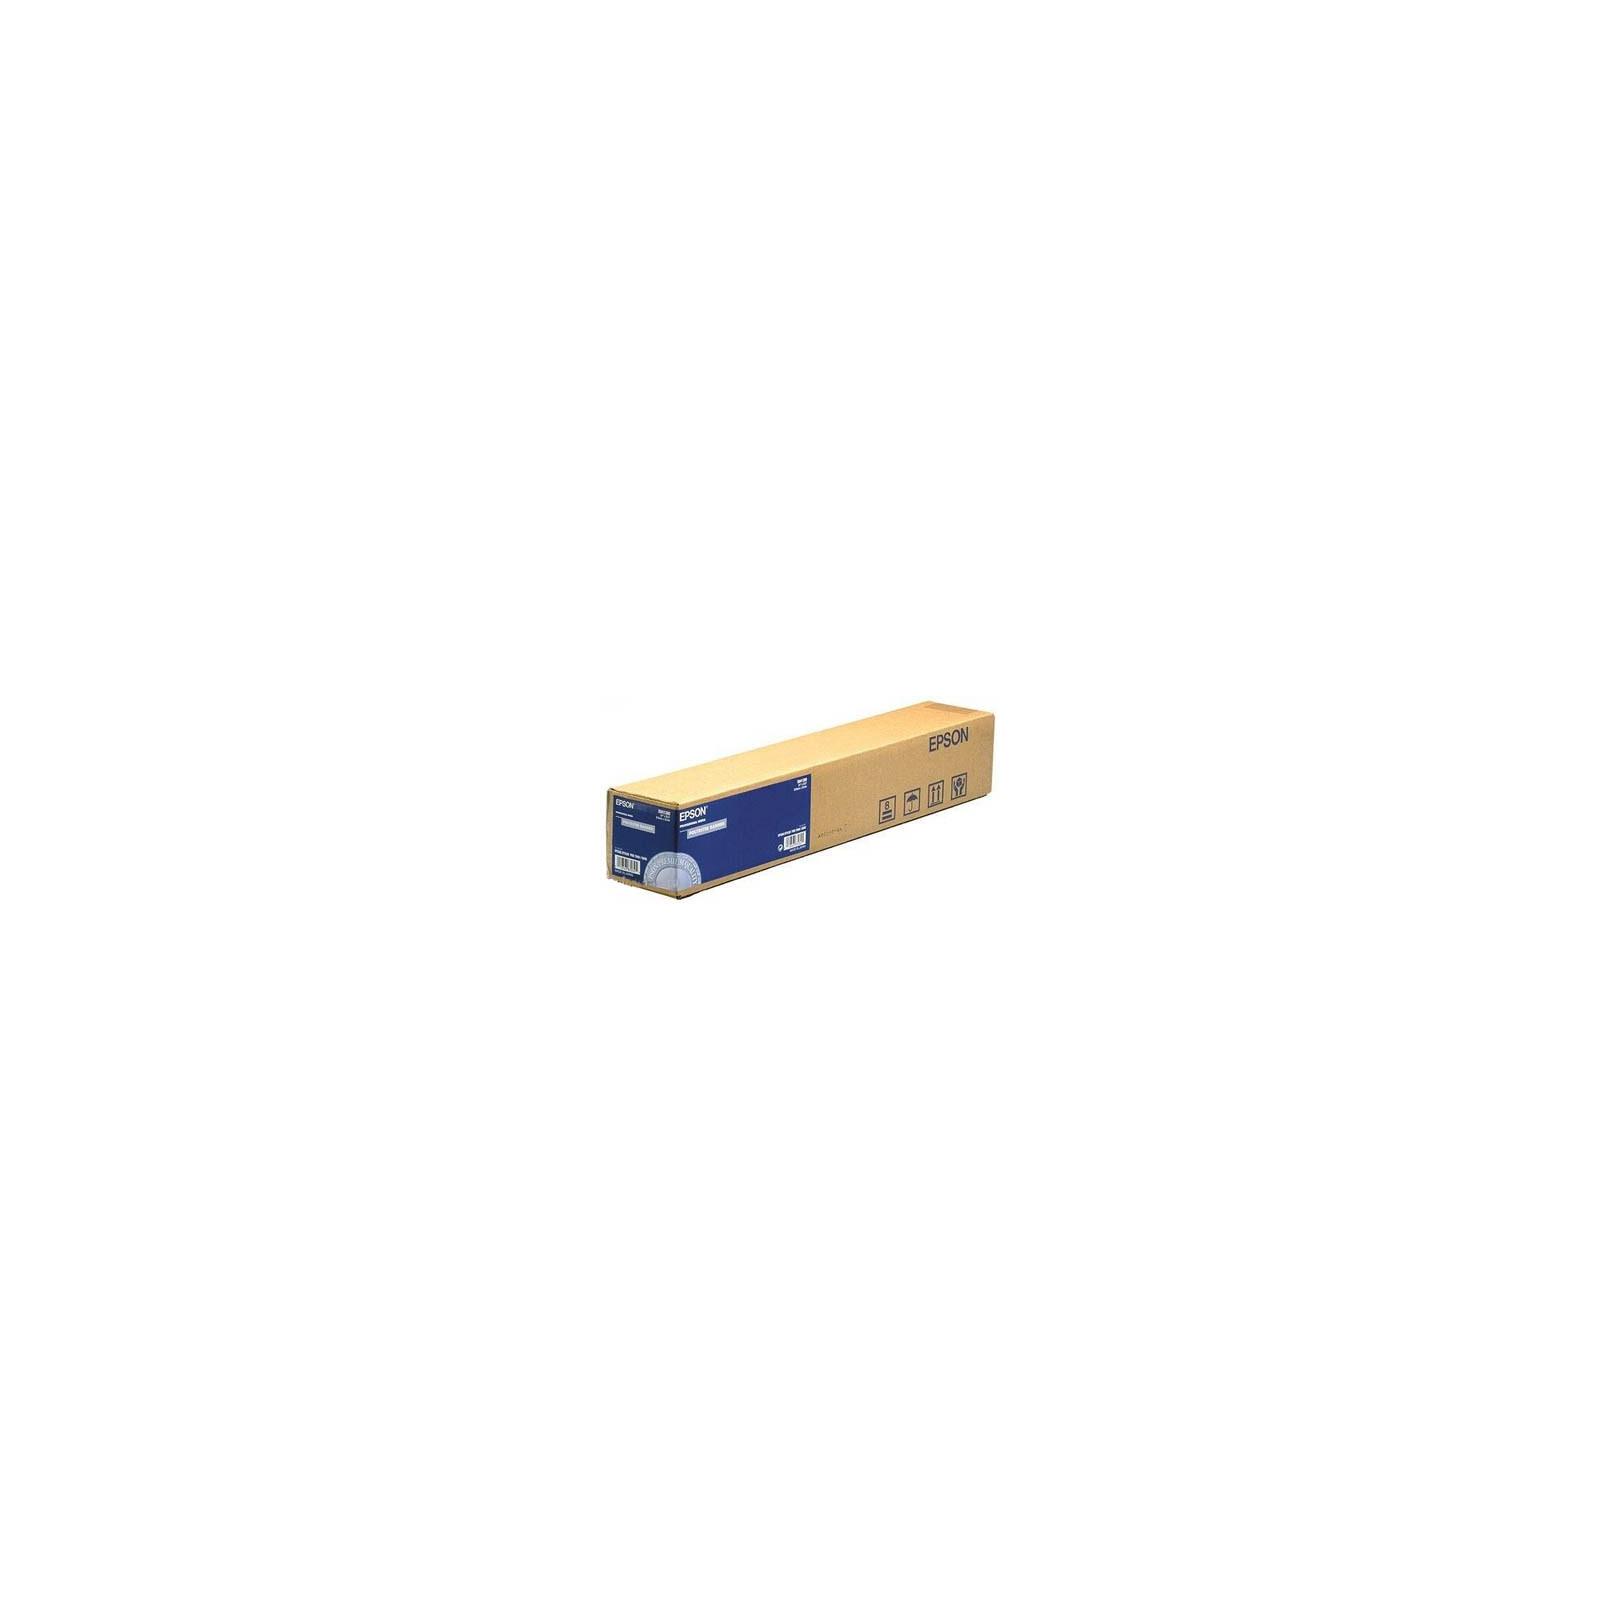 "Бумага EPSON 24"" Doubleweight Matte Paper (C13S041385)"